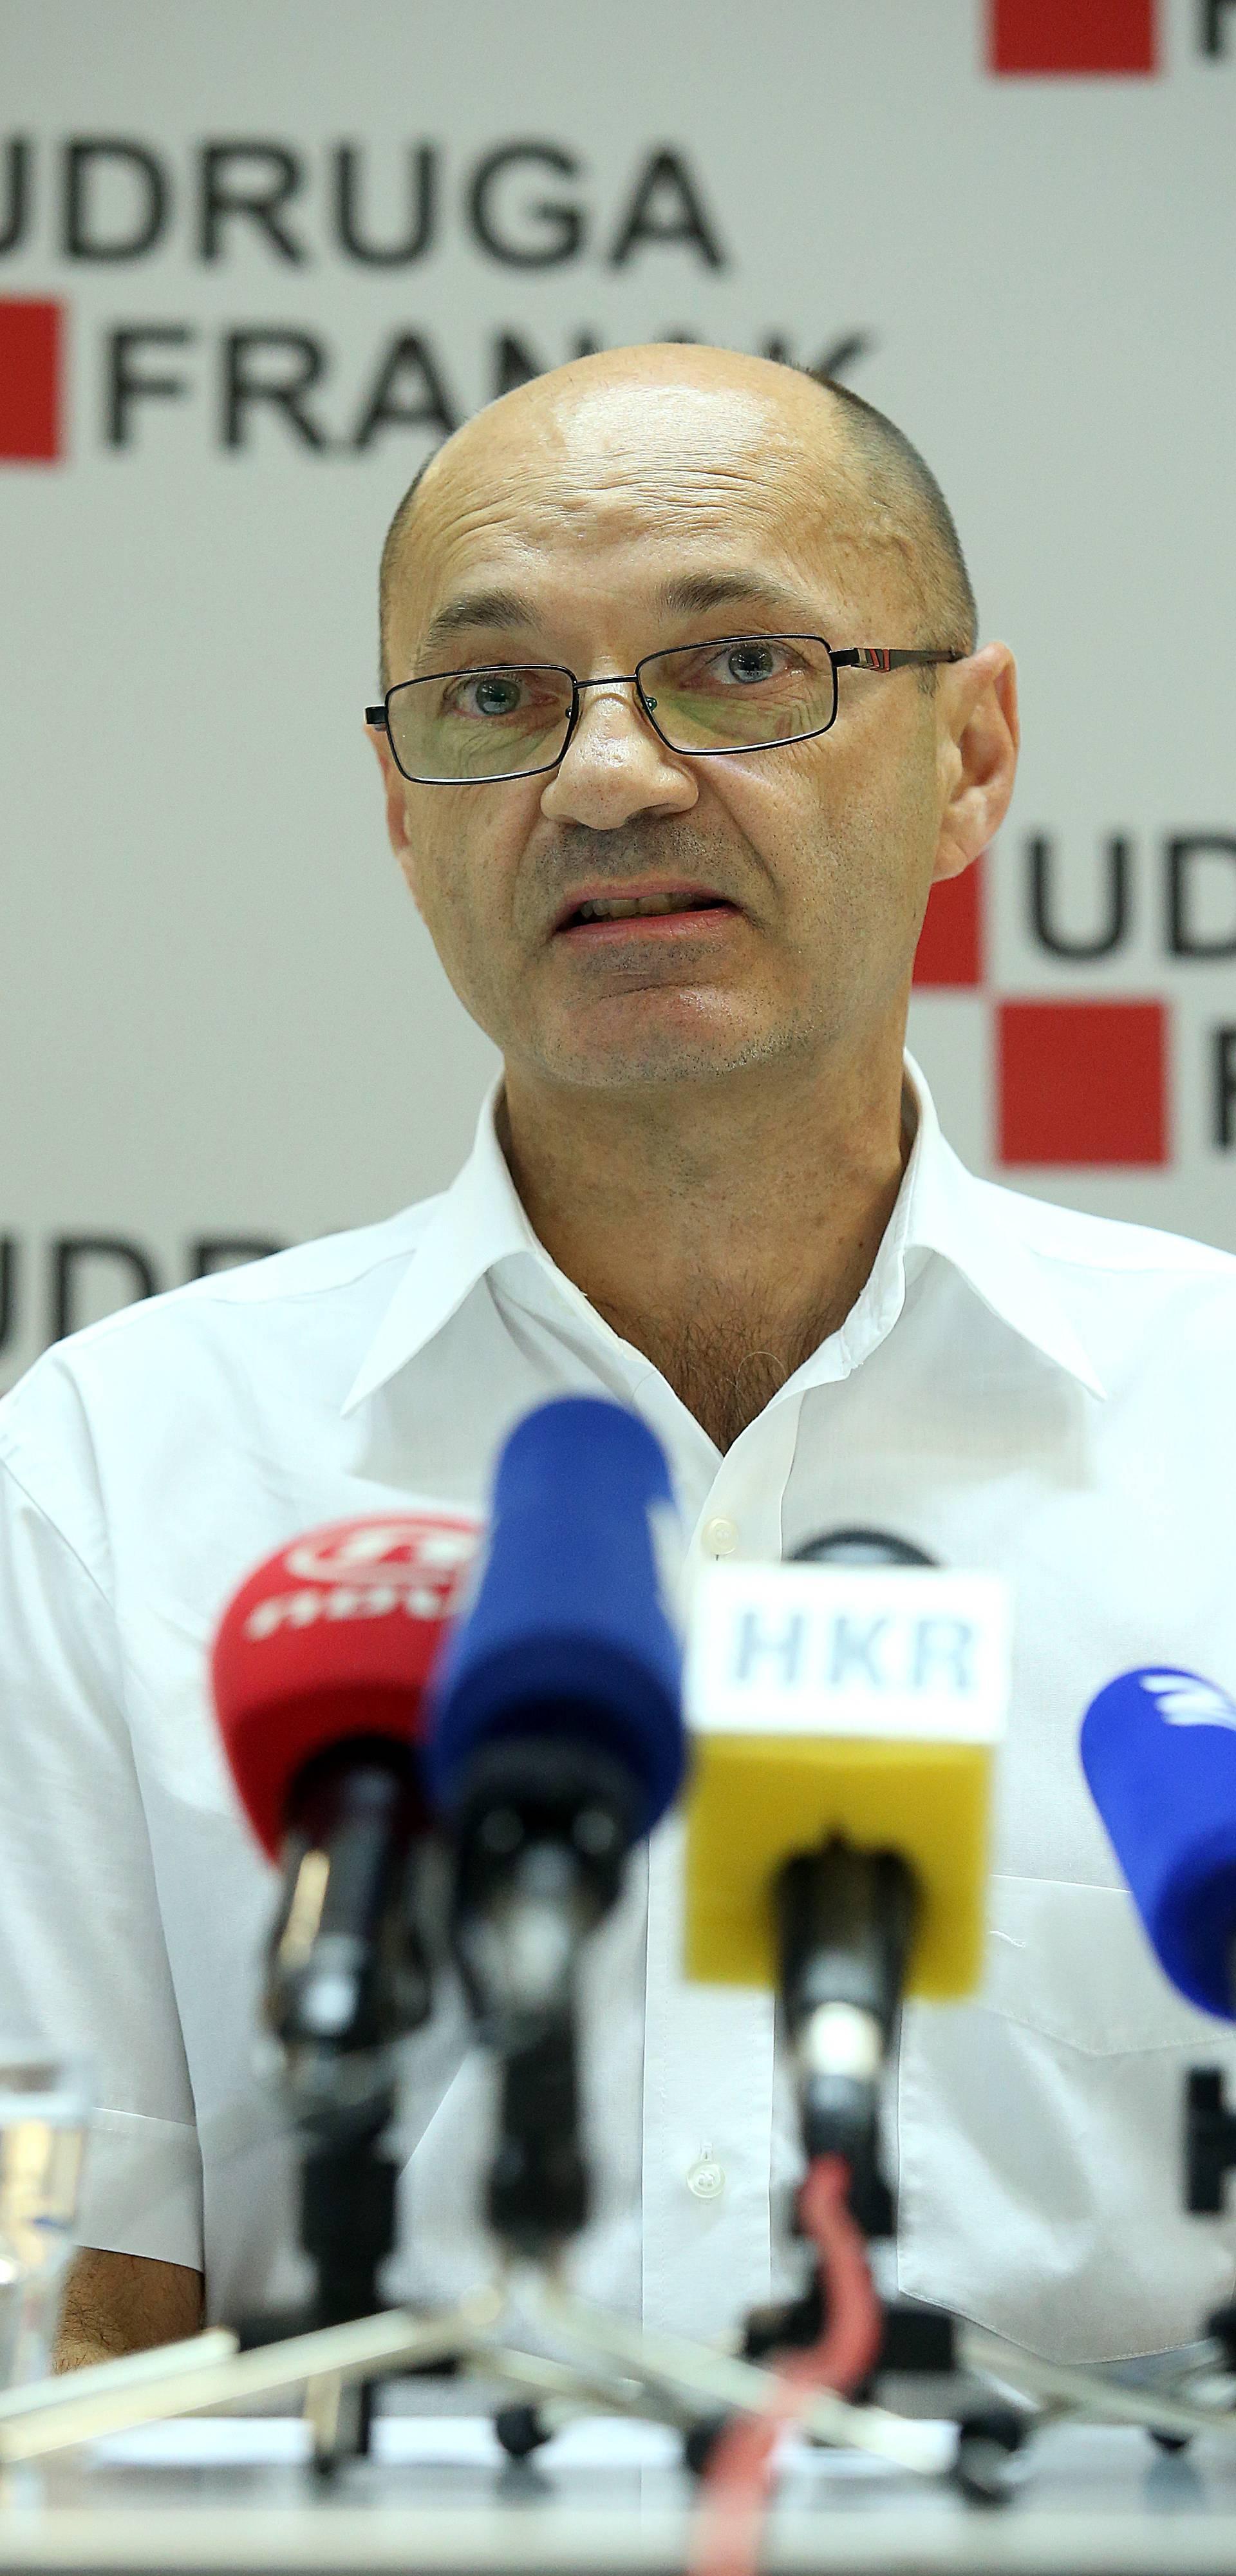 Zastupnik Udruge Franak je osnovao novu stranku SNAGA